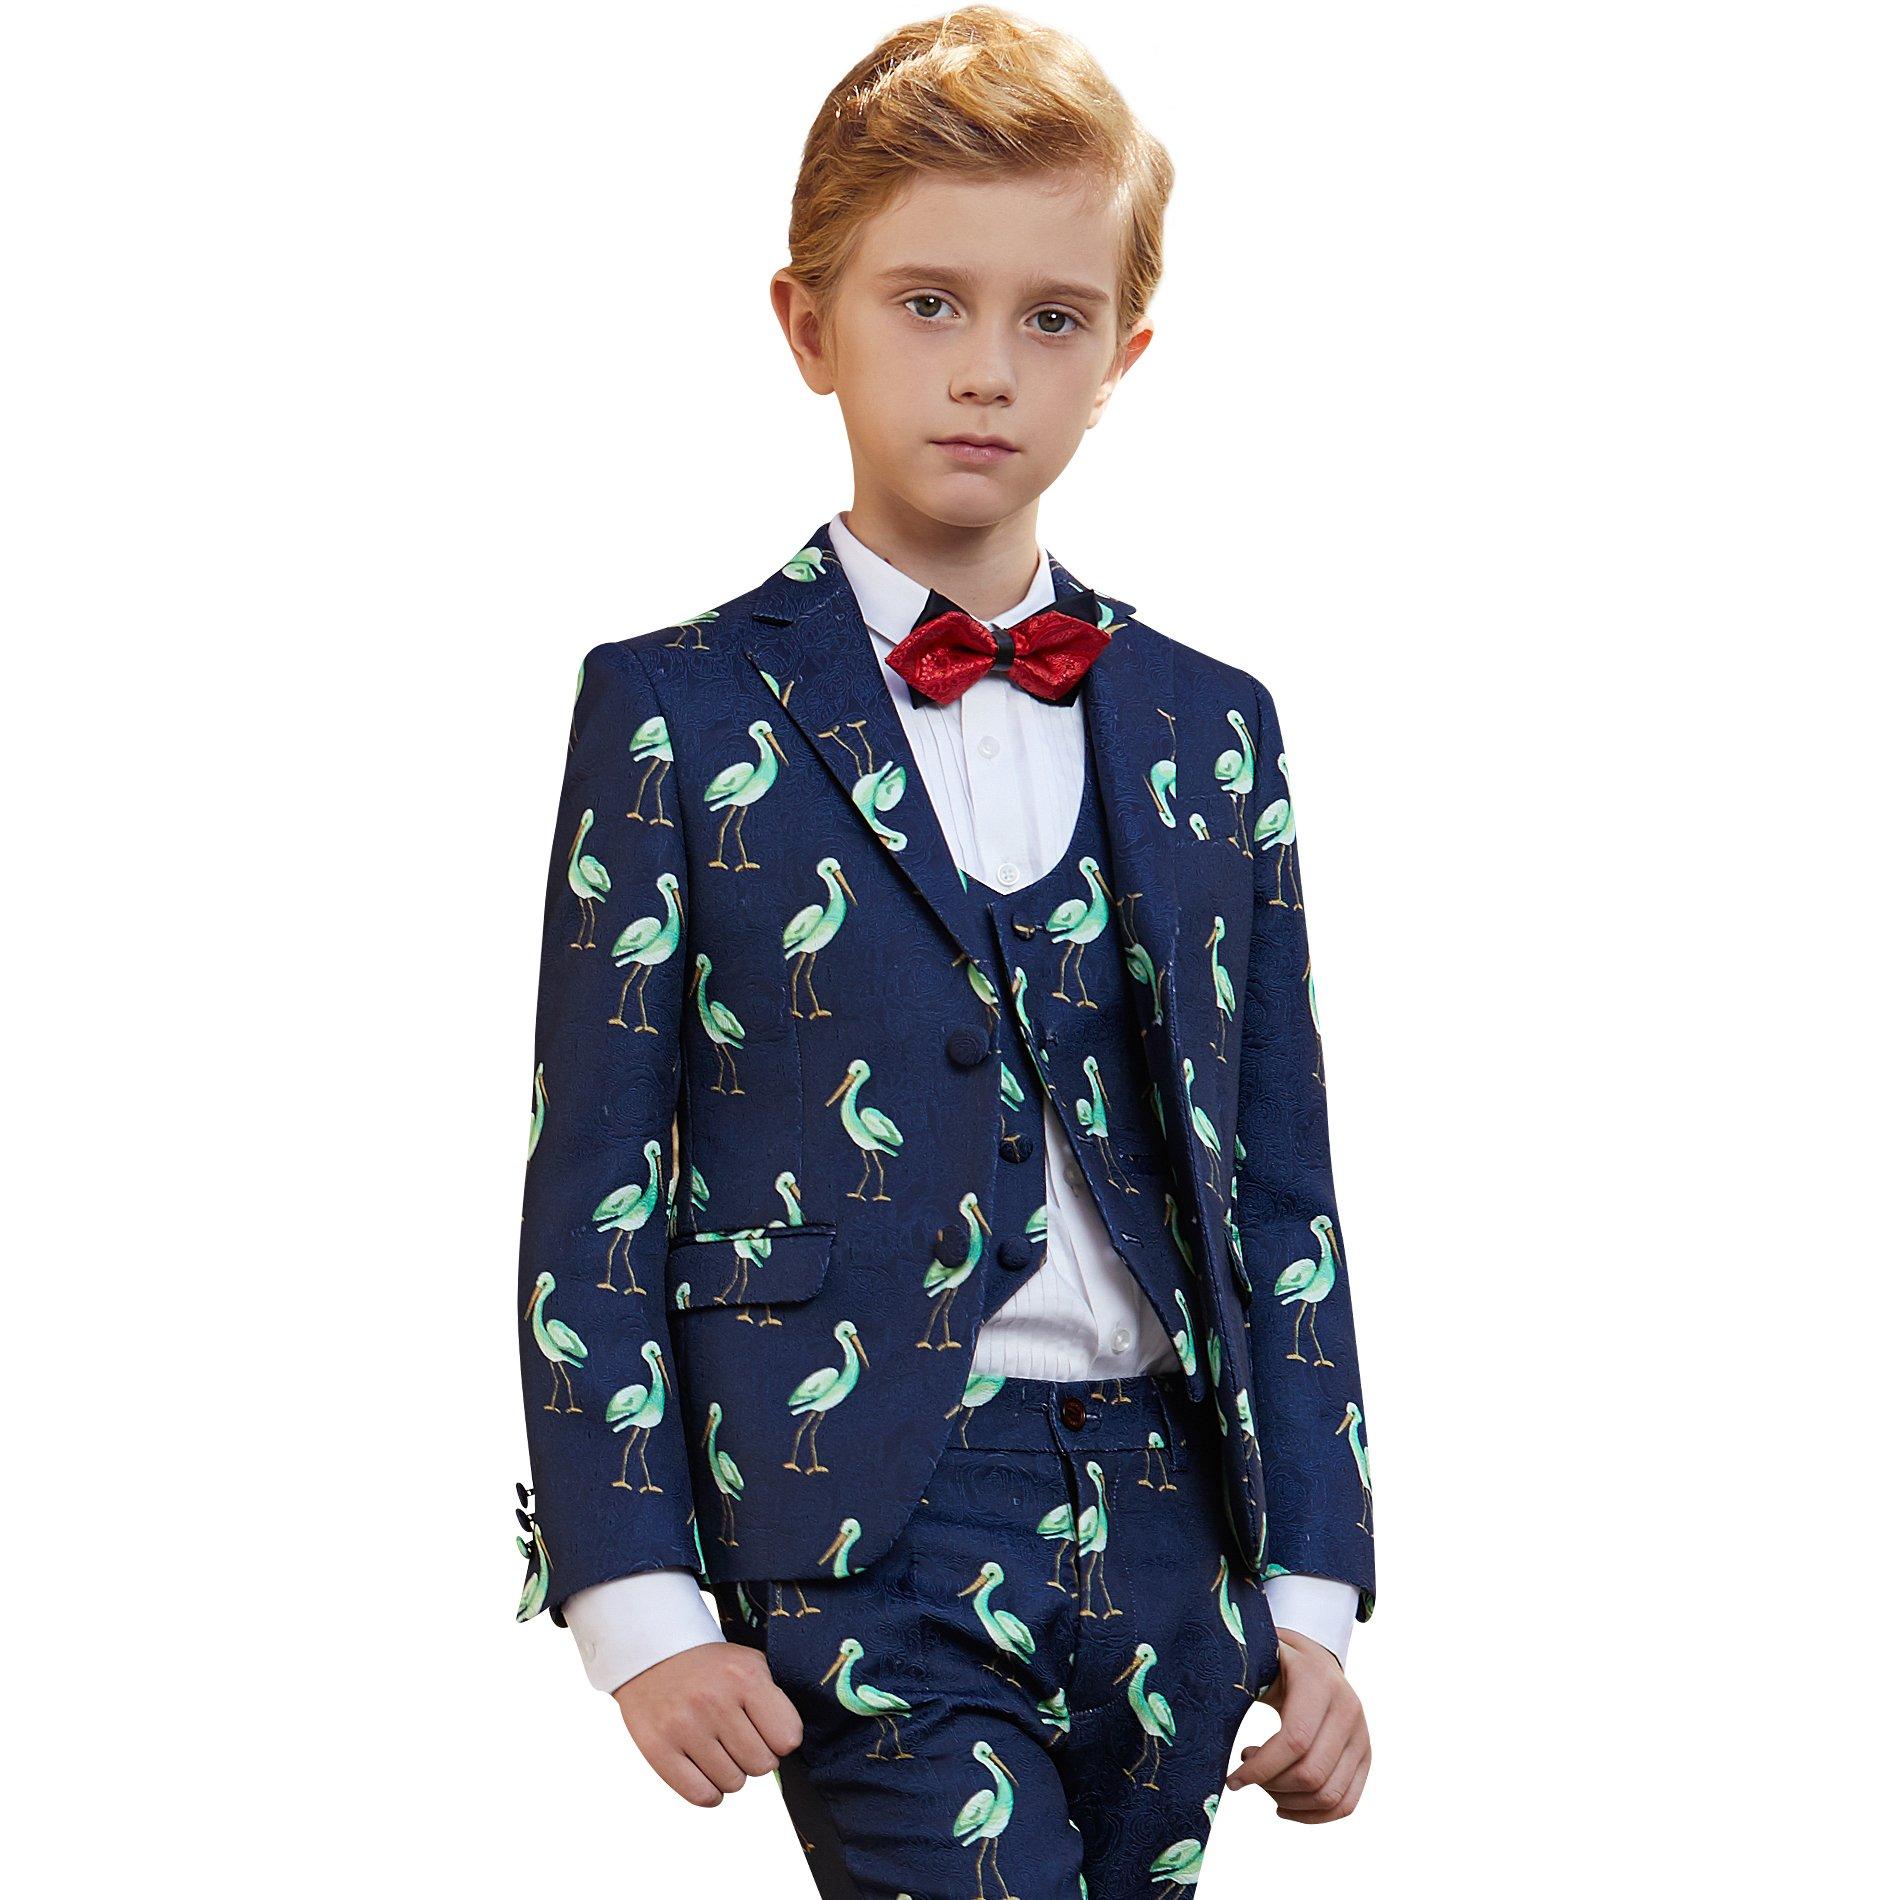 ELPA ELPA Boys Slim Fit 8 Piece Suits Formal Outfit Creative Design Dress Set Green Embroidery Blazer White Vest Pants (8) by ELPA ELPA